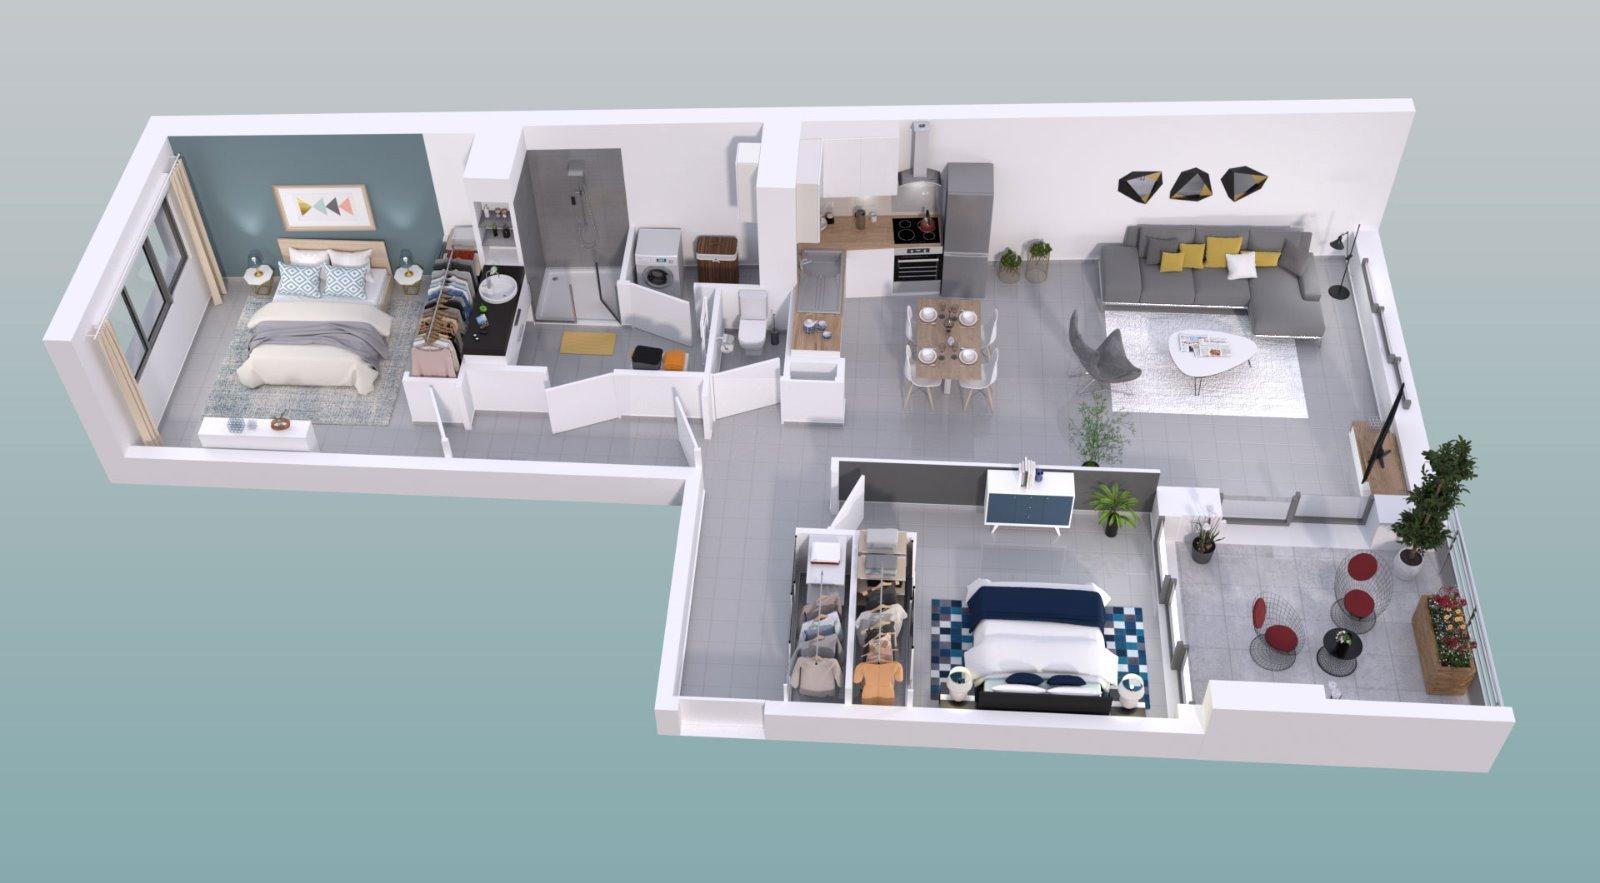 Achat Appartement 3 Pièces 75 M² Montpellier 464 000